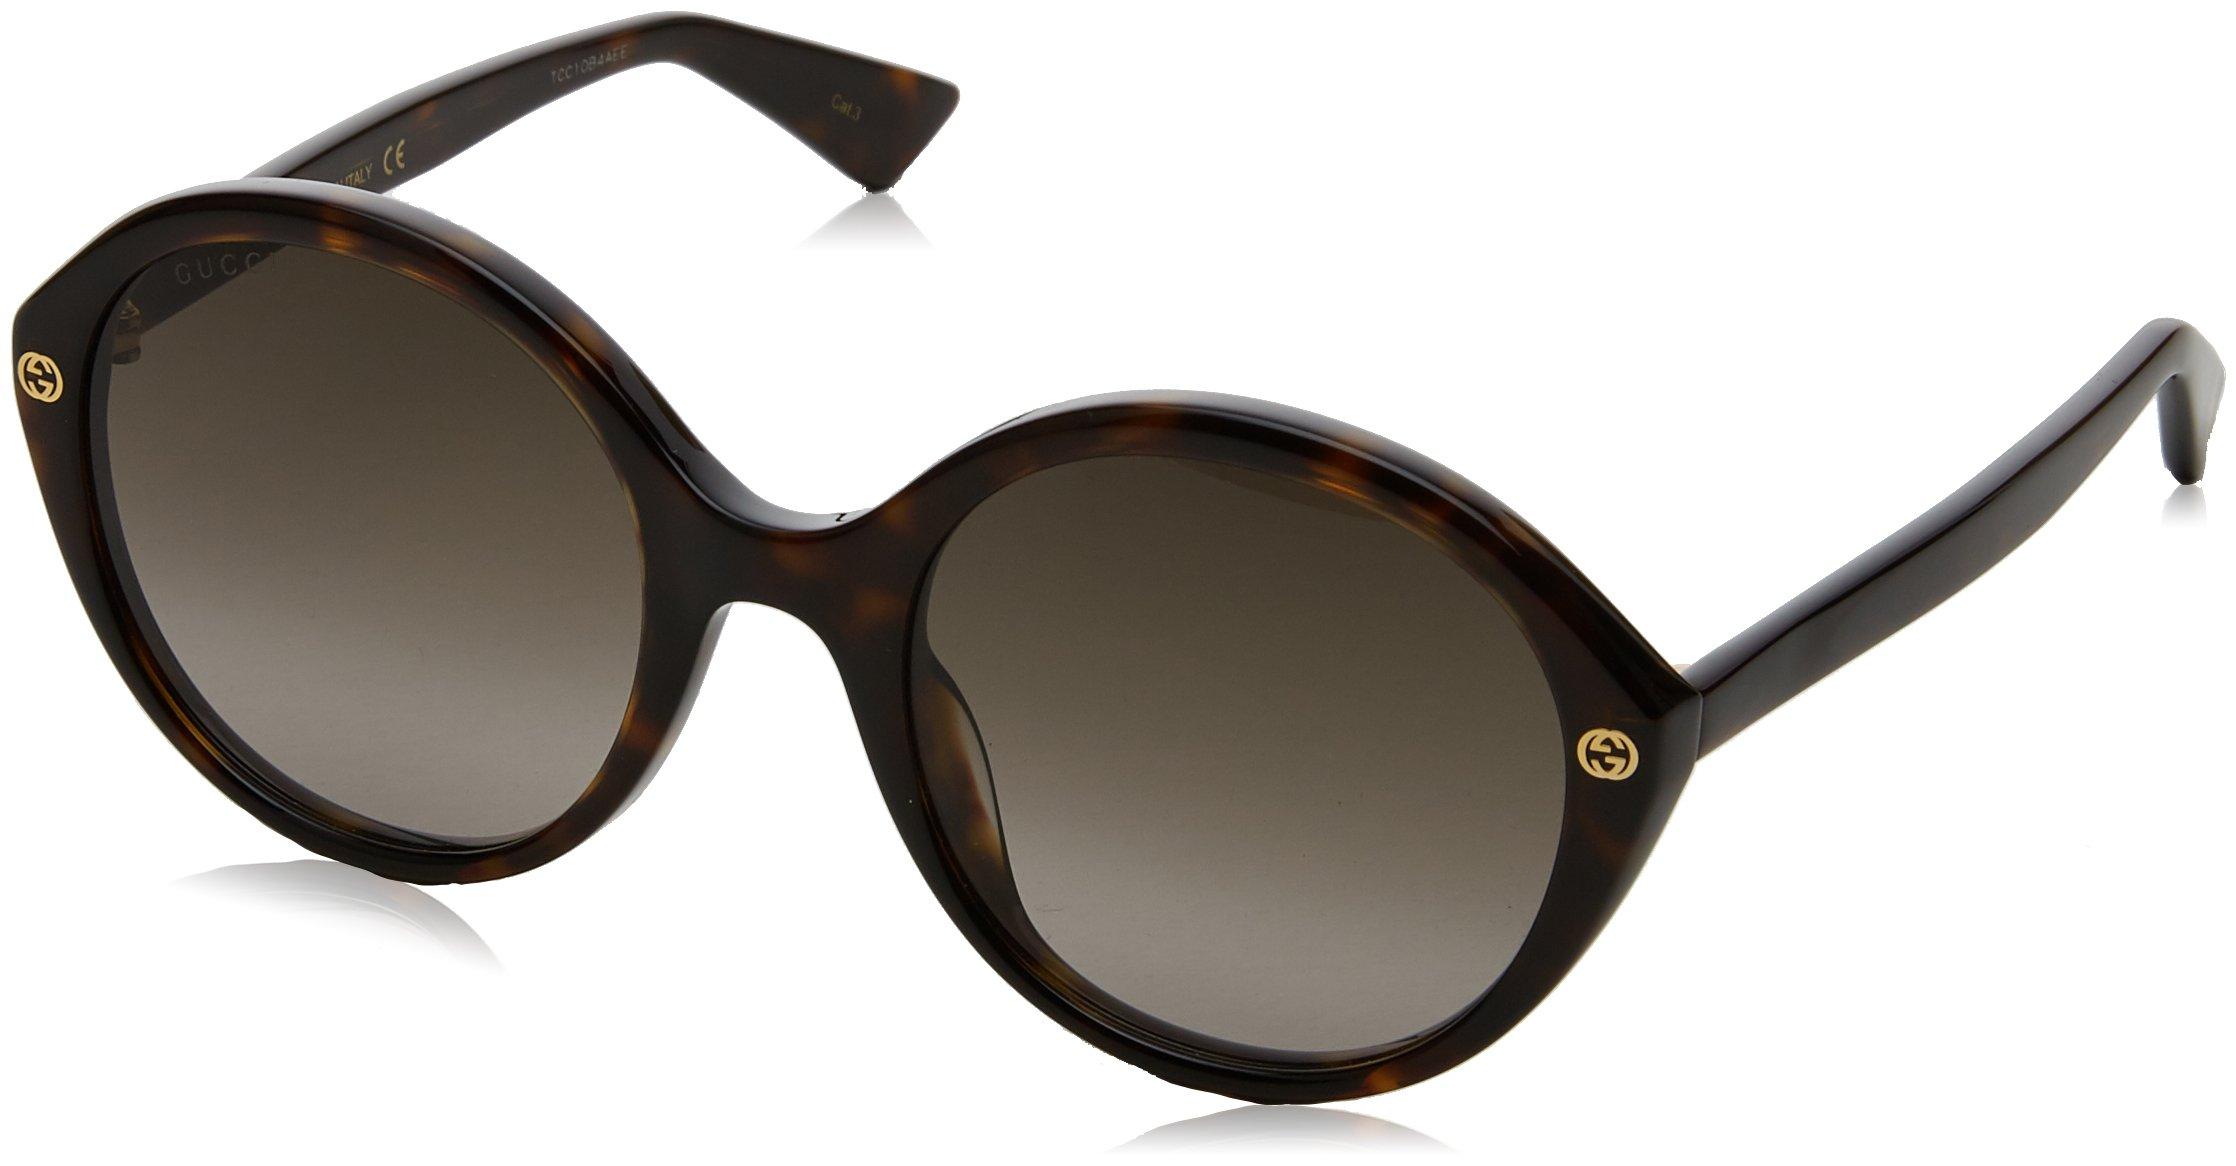 Gucci Women's GG0023S GG/0023/S 002 Havana/Gold Fashion Sunglasses 55mm